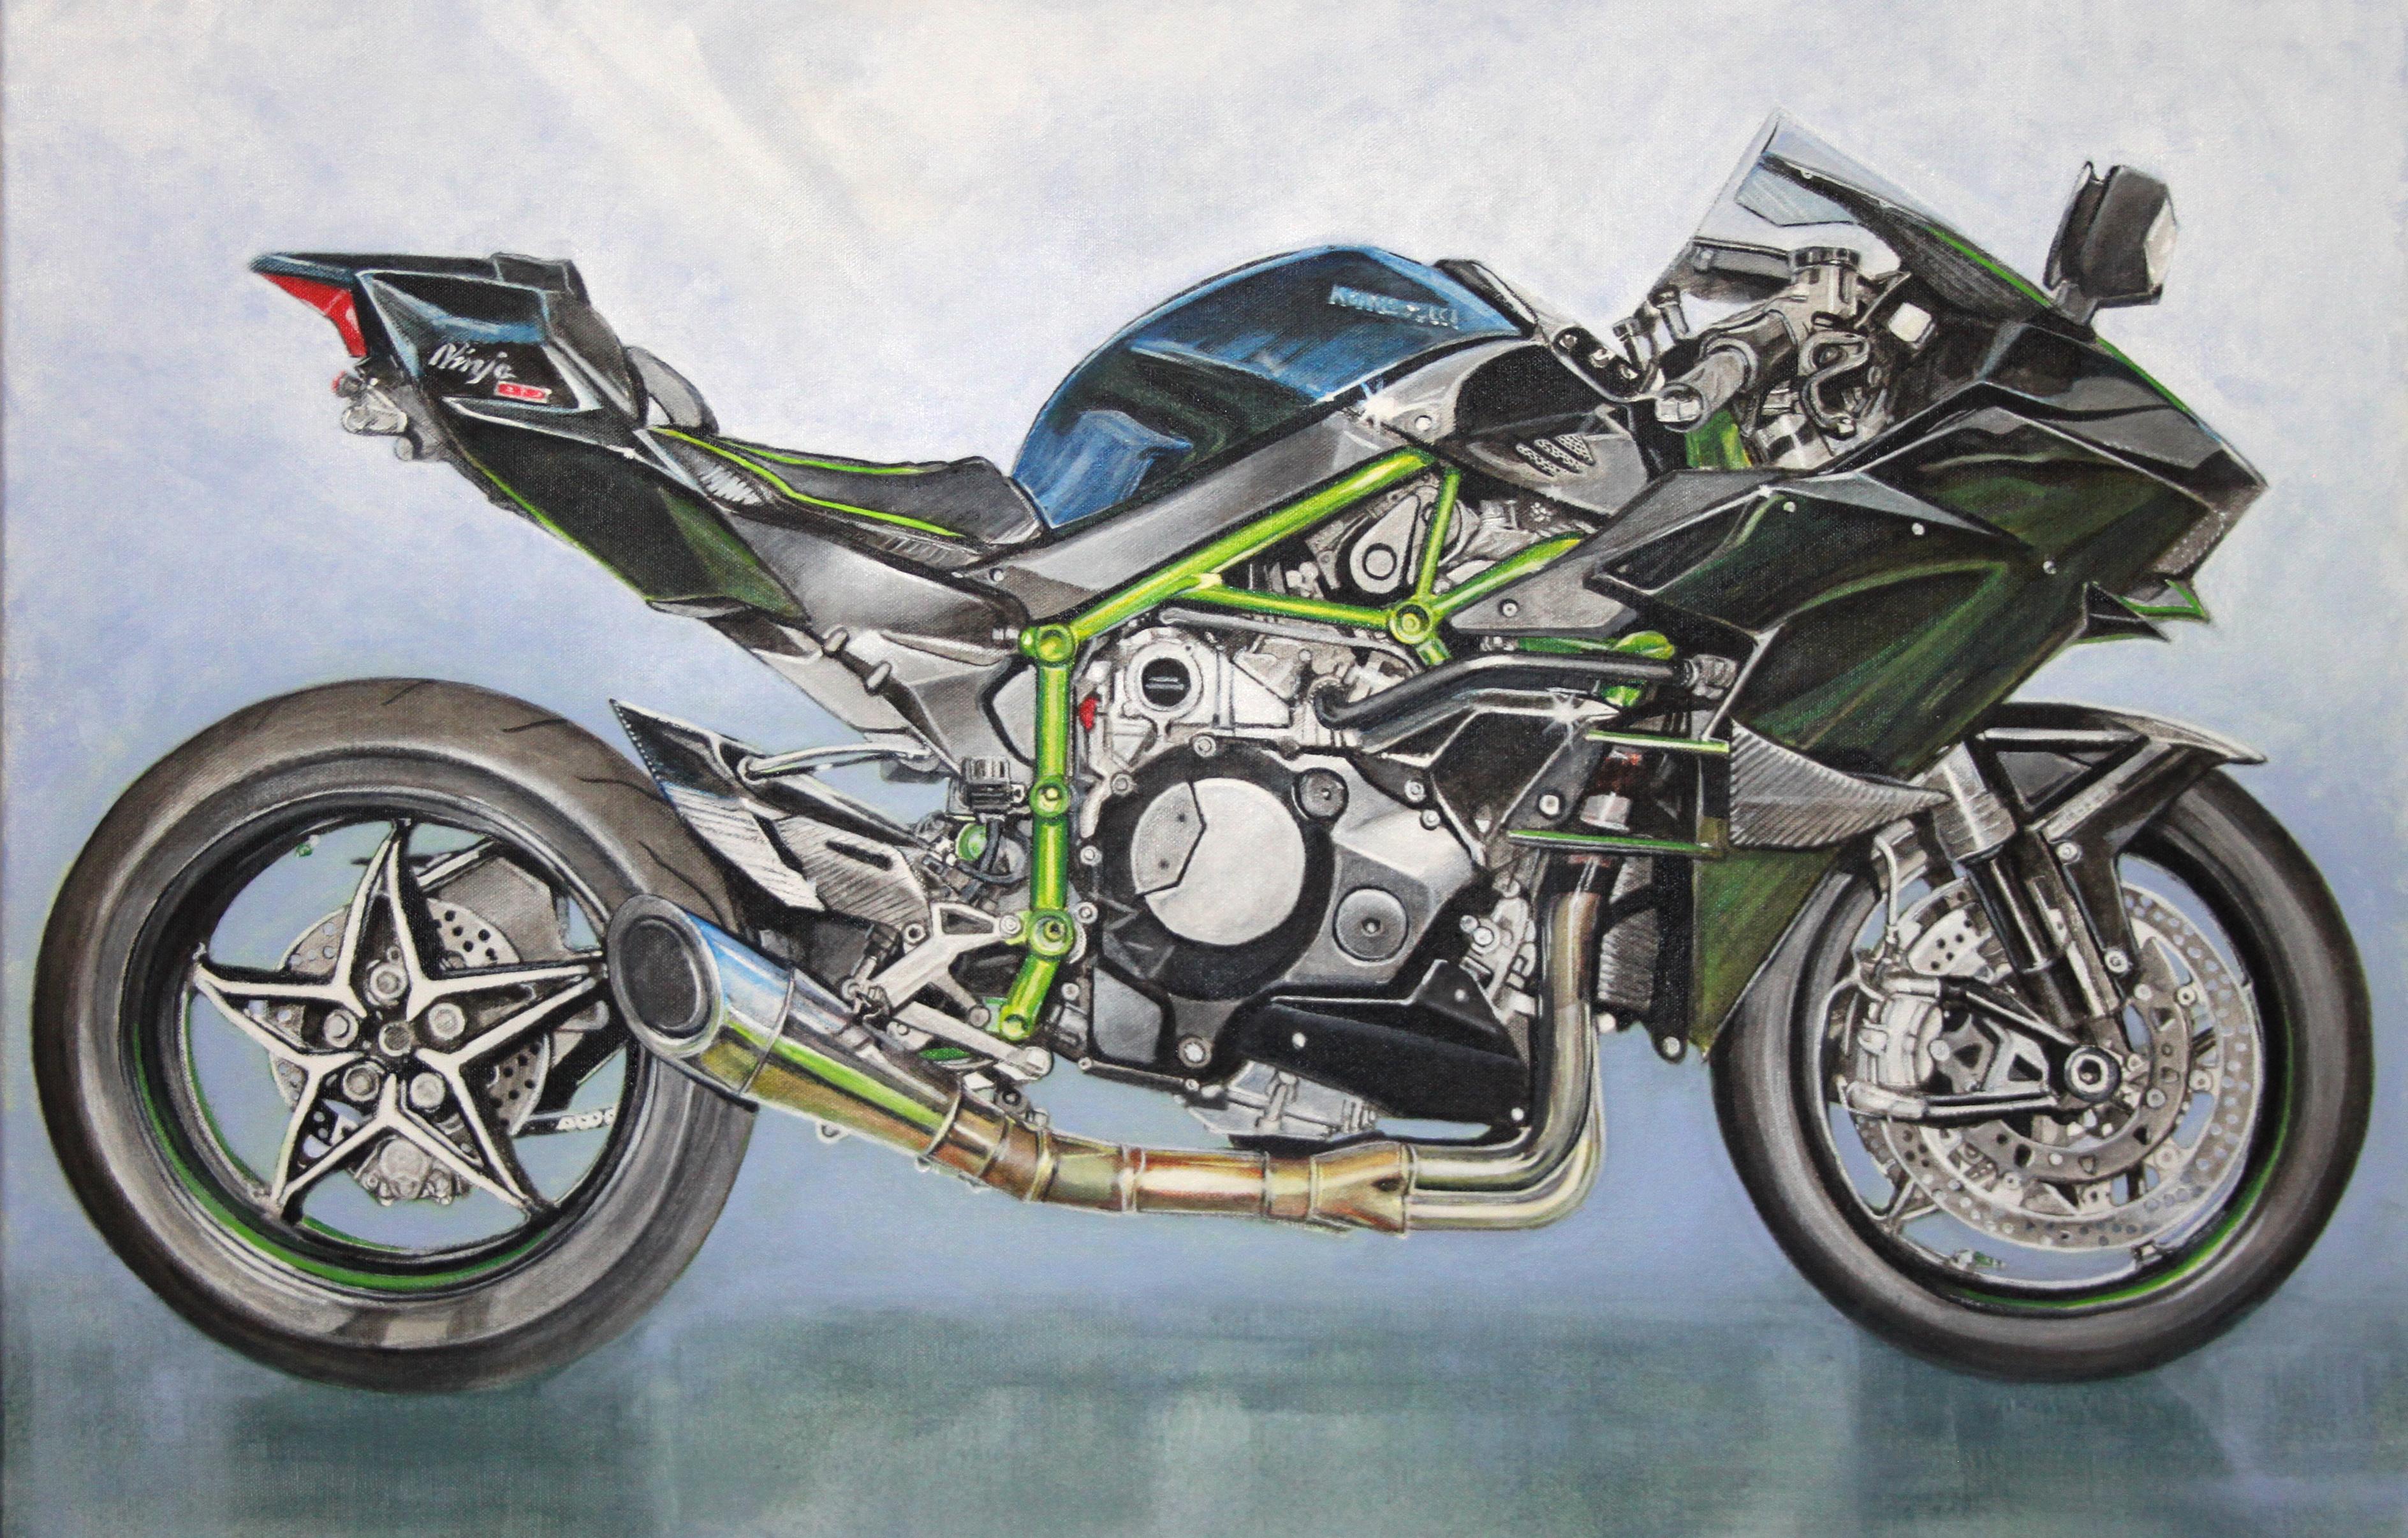 Kawasaki Ninja H2 motorbike